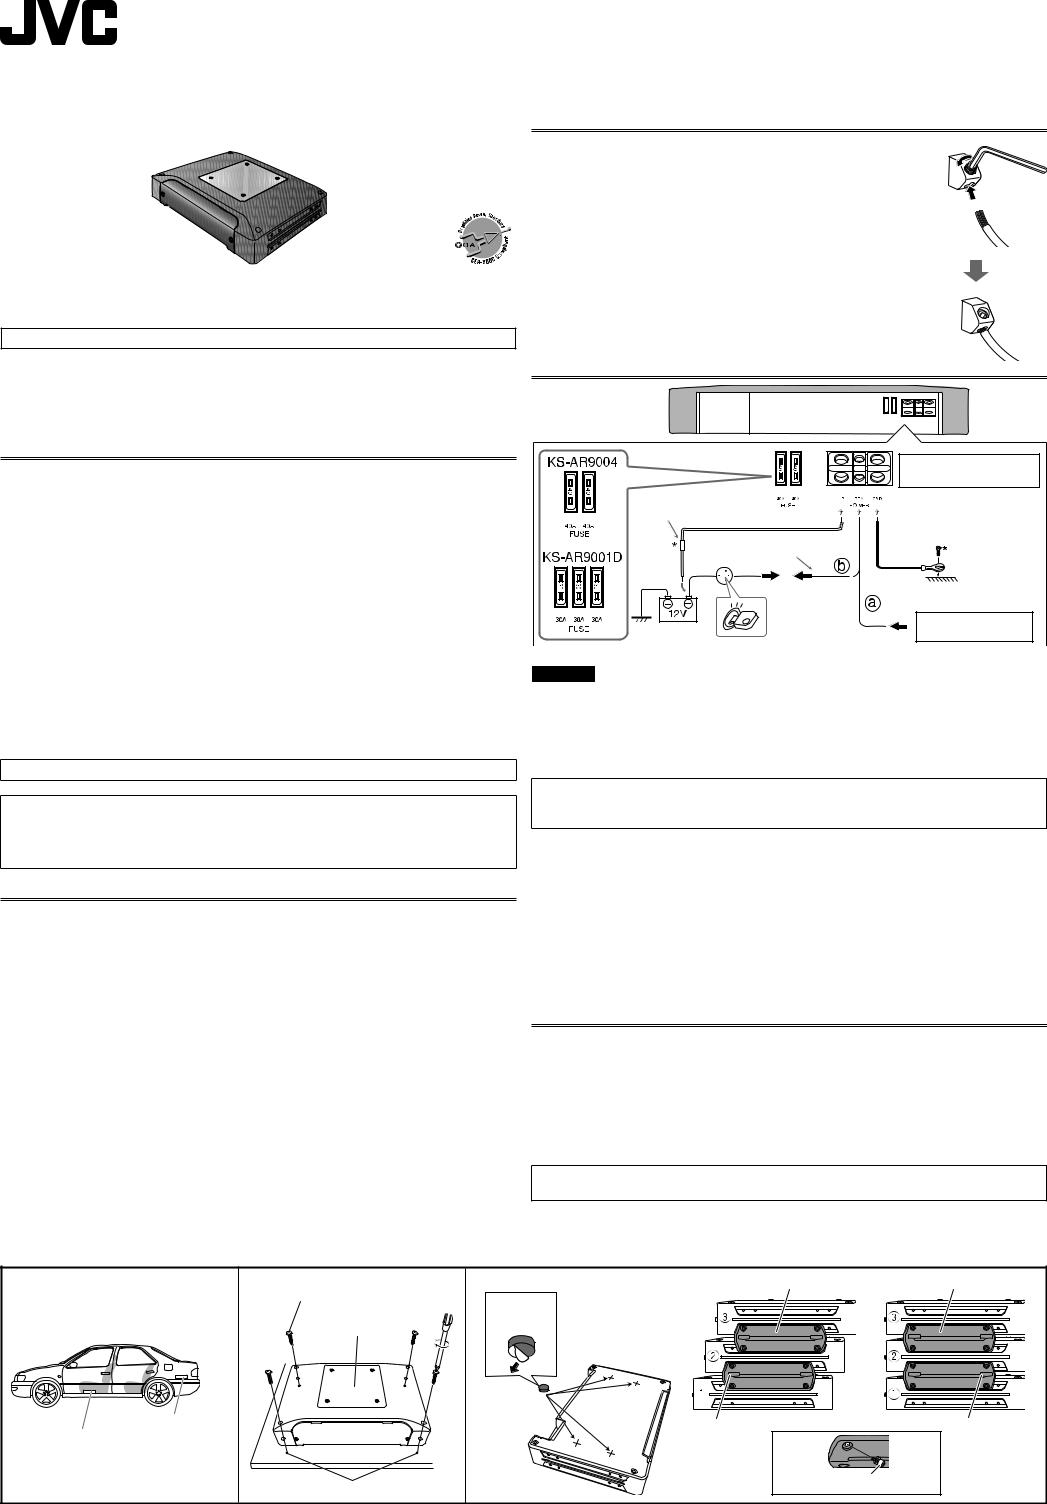 JVC KS-AR9001D, KS-AR9004 User ManualManualMachine.com